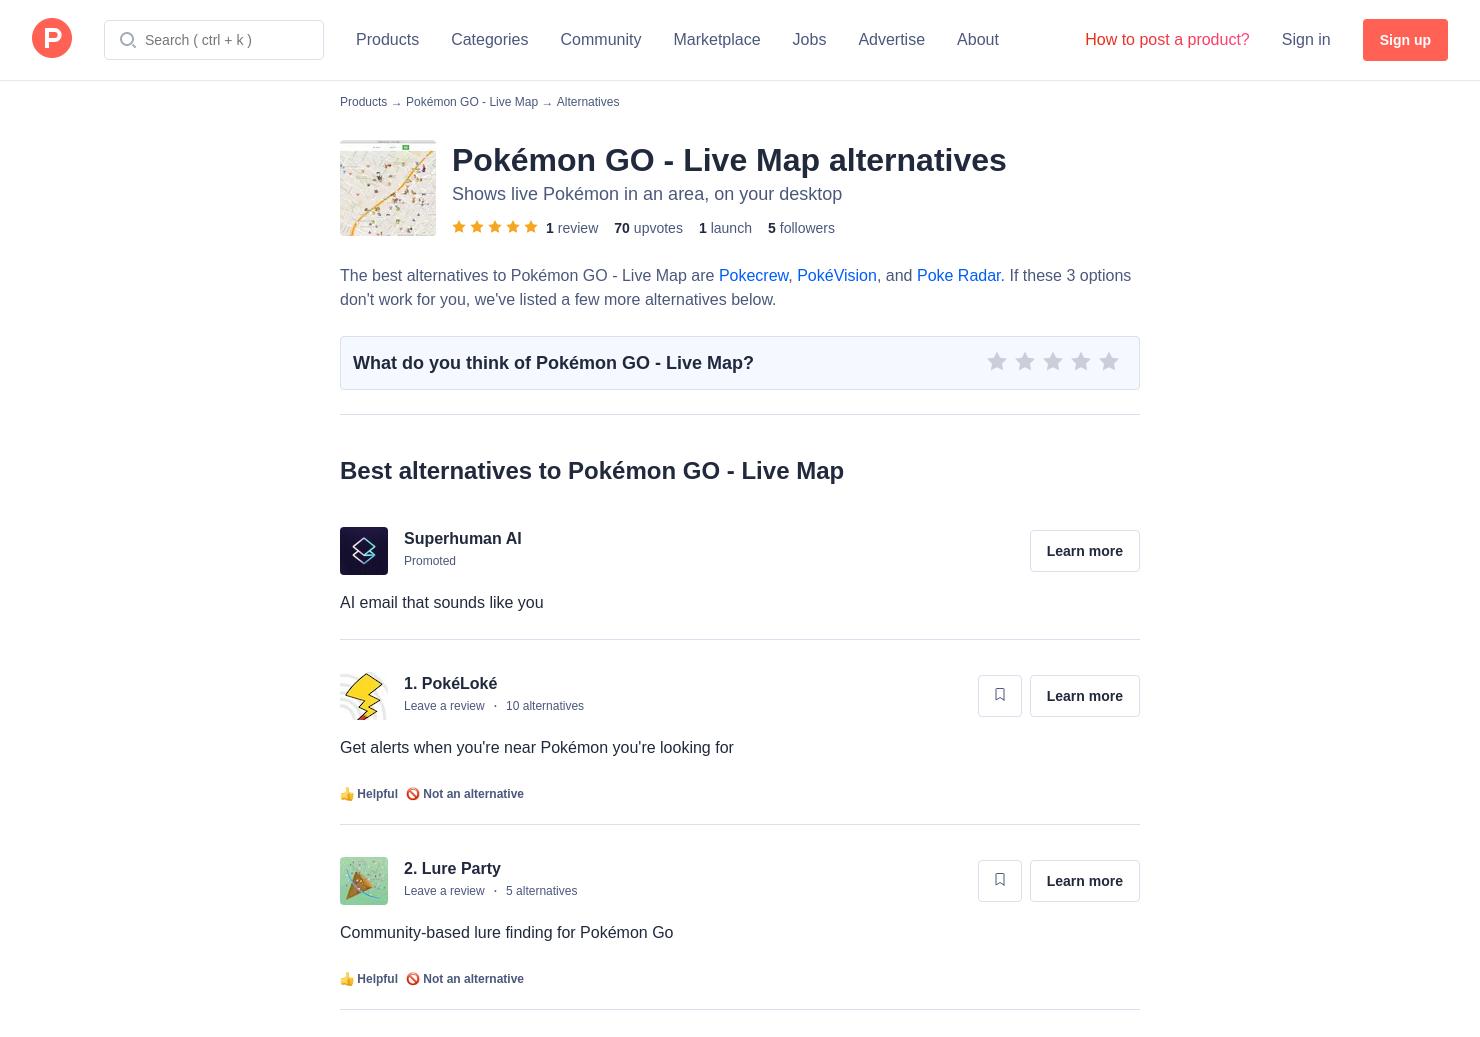 14 Alternatives to Pokémon GO - Live Map for Mac | Product Hunt